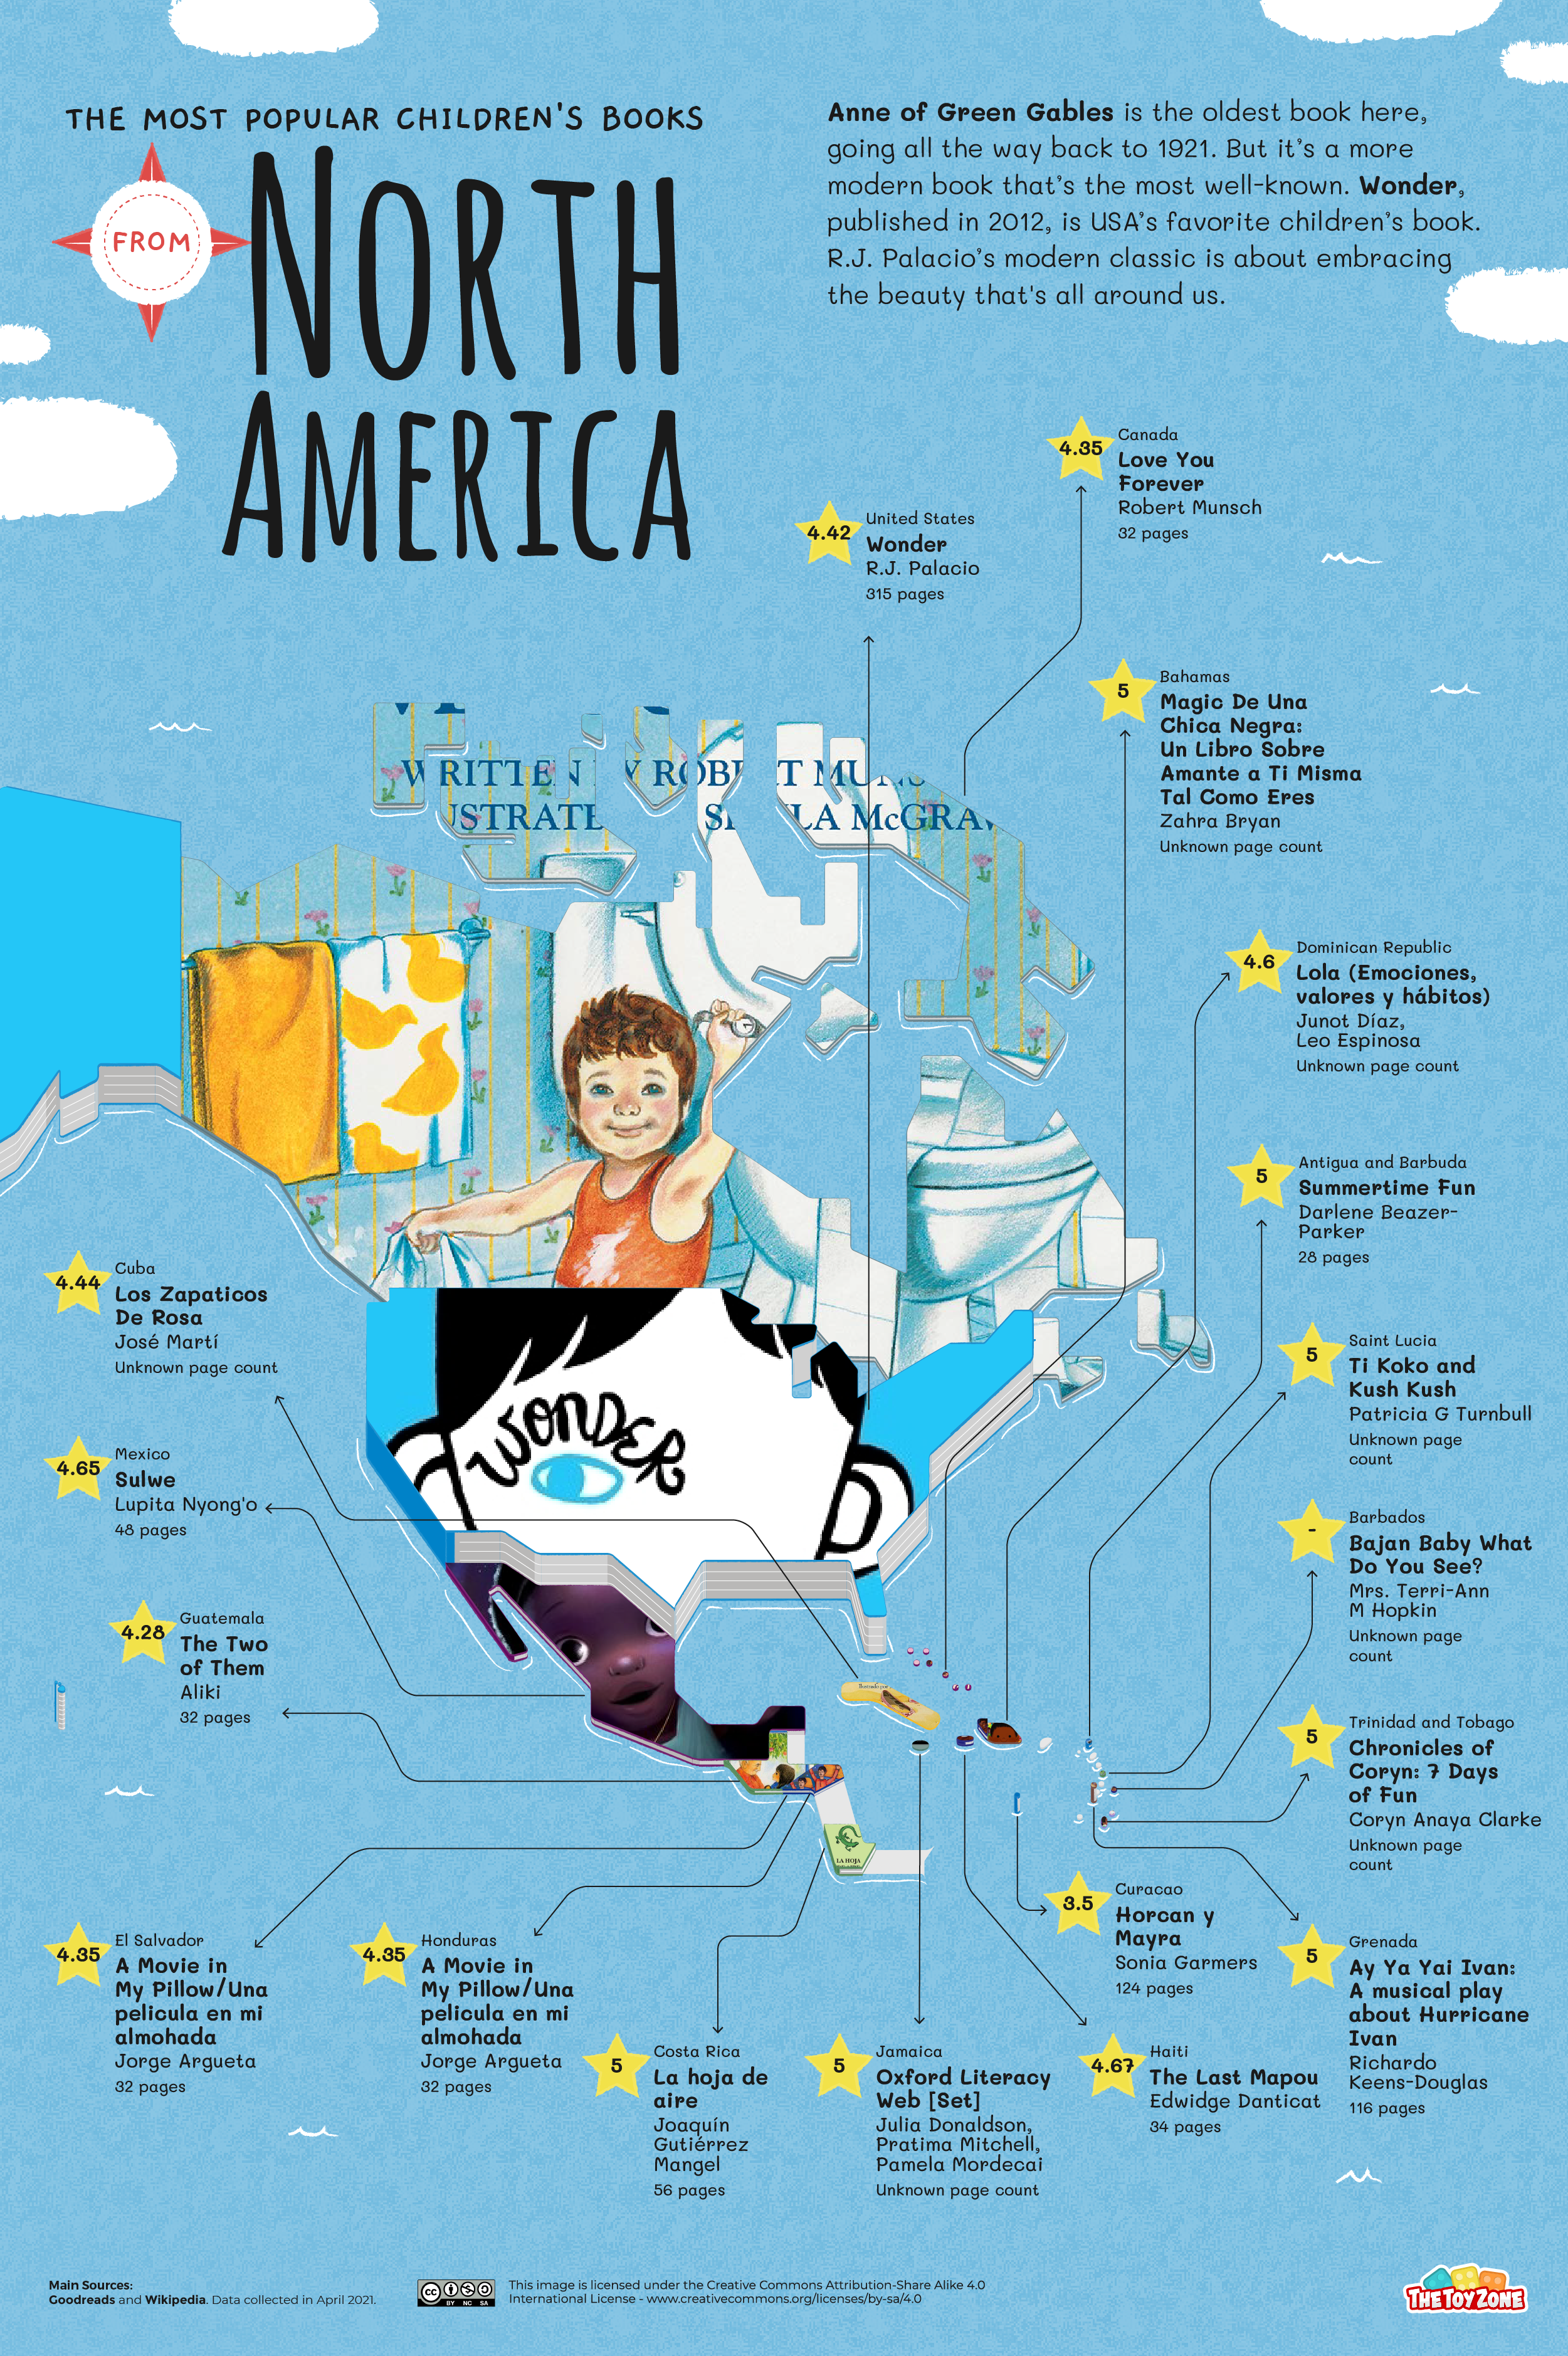 Most popular children's books in North American map